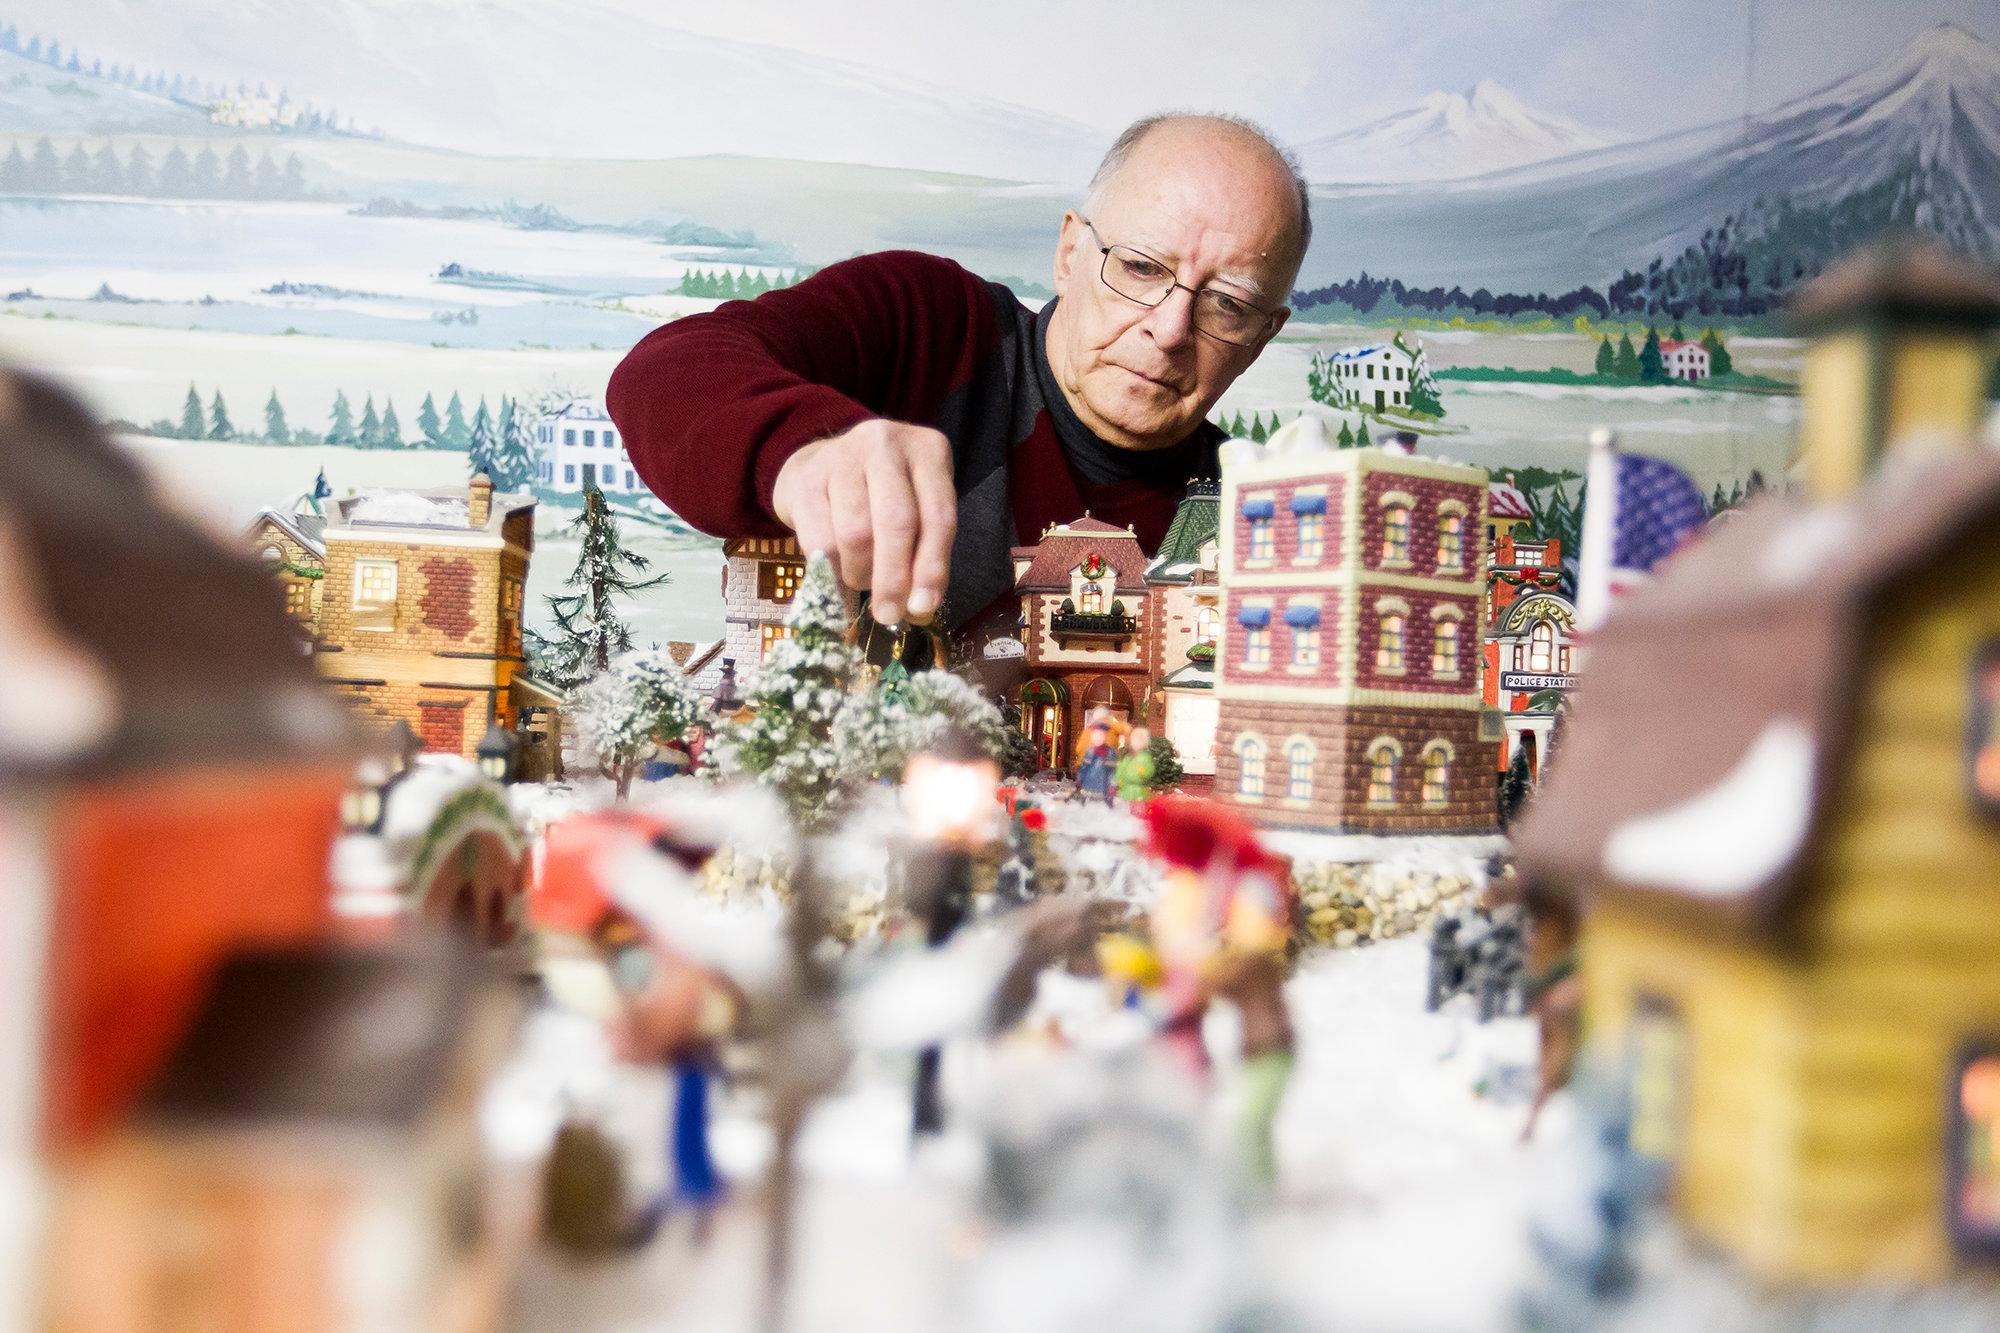 hstyle_adv_Christmas_Village_01.JPG